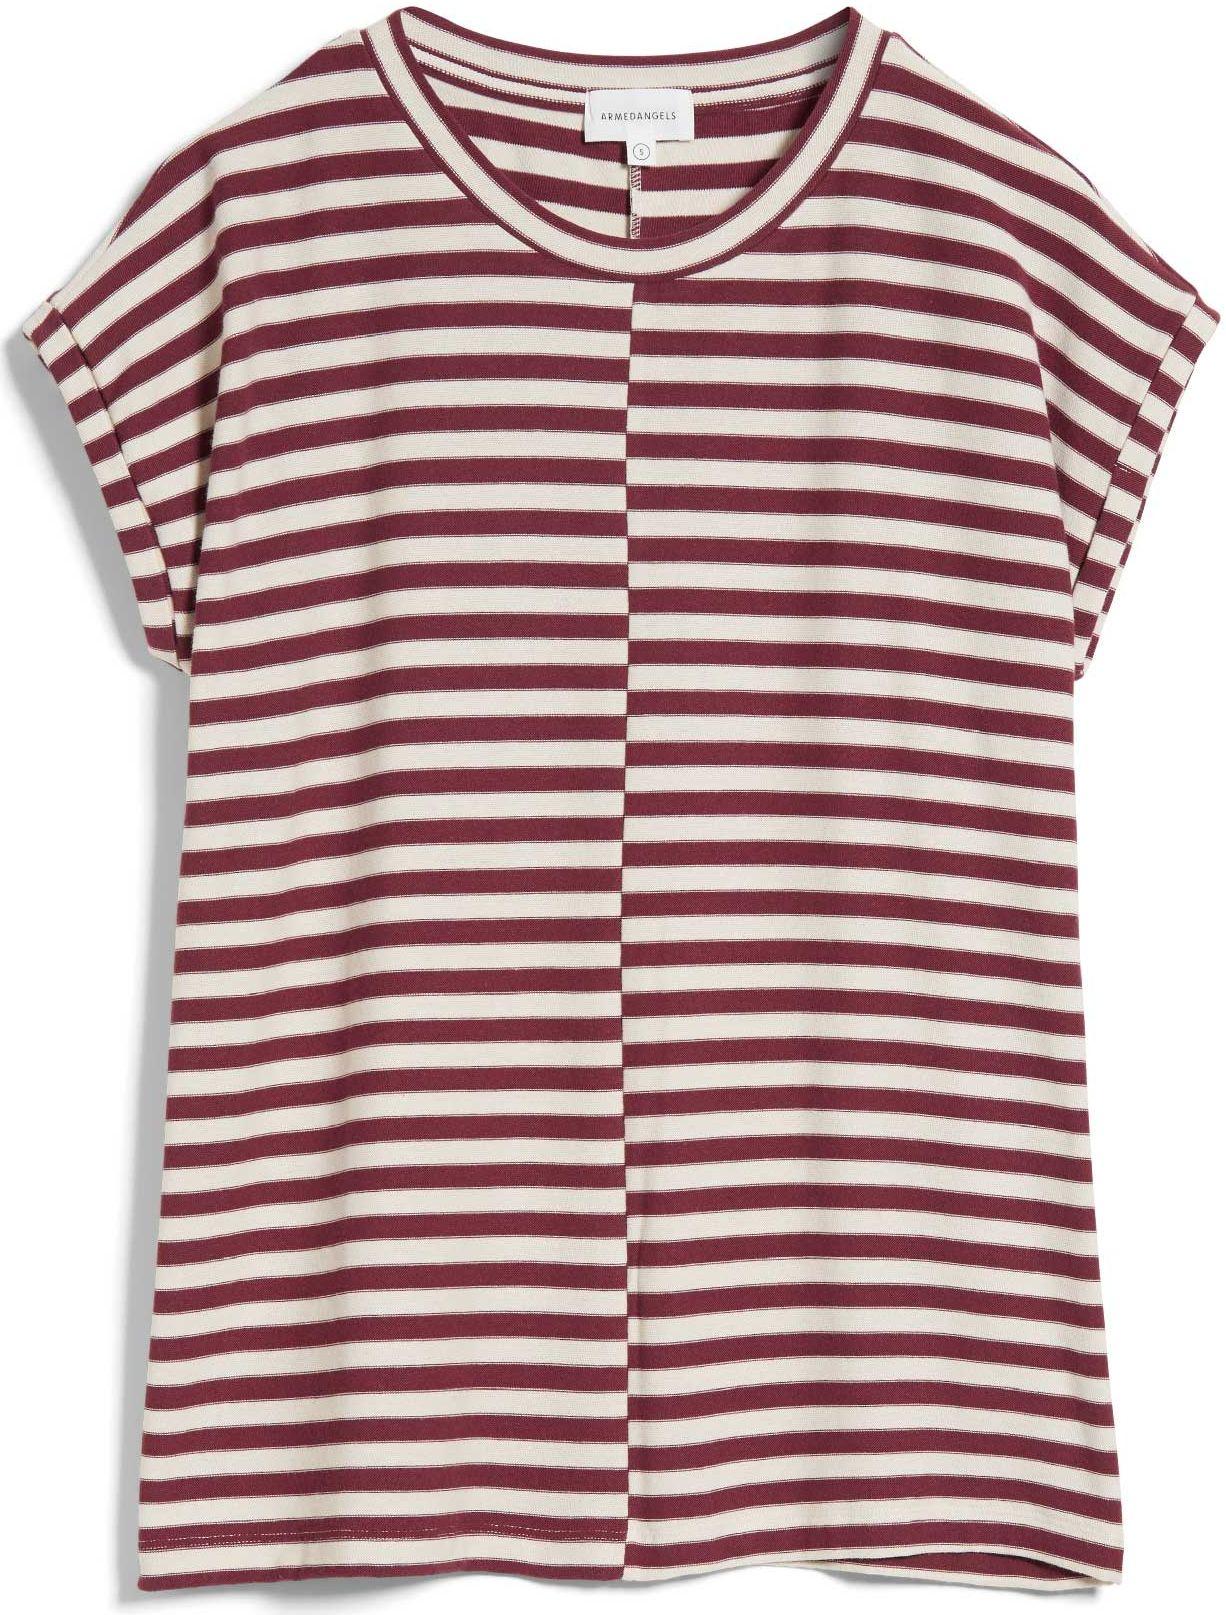 Damen-Shirt JAARIN KNITTED STRIPE kitt/ ruby red